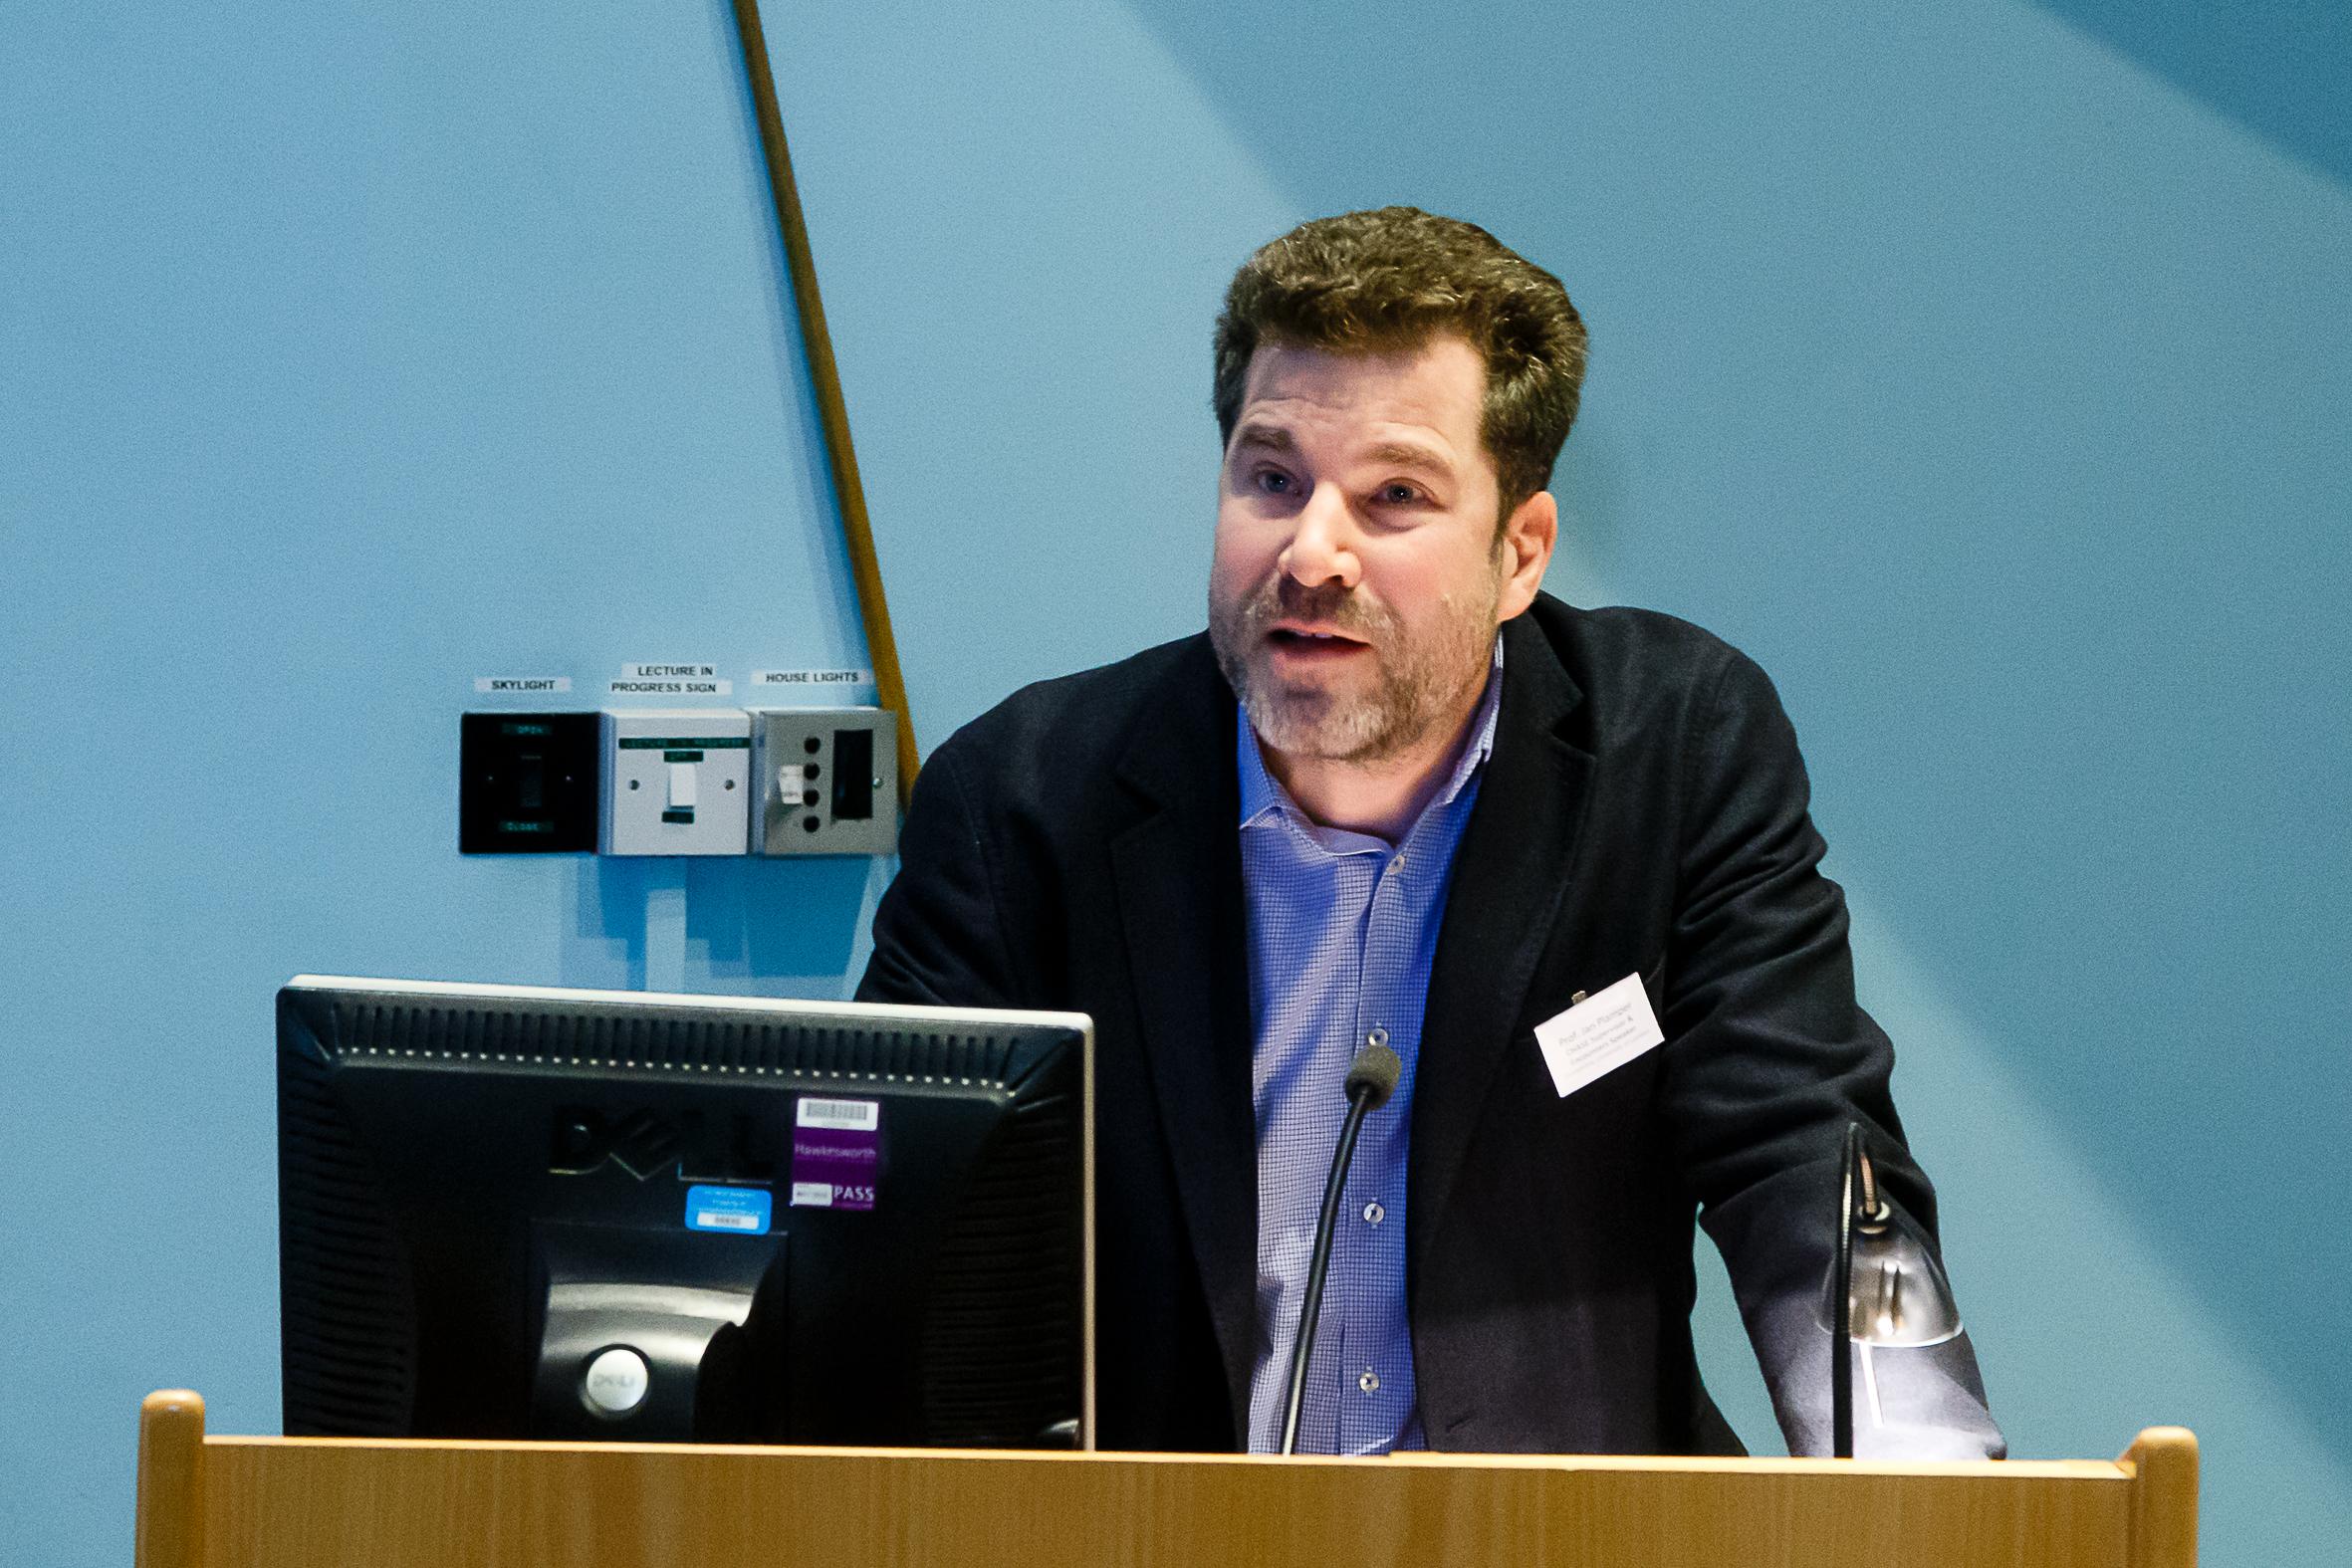 Professor Jan Plamper - Goldsmiths, University of London